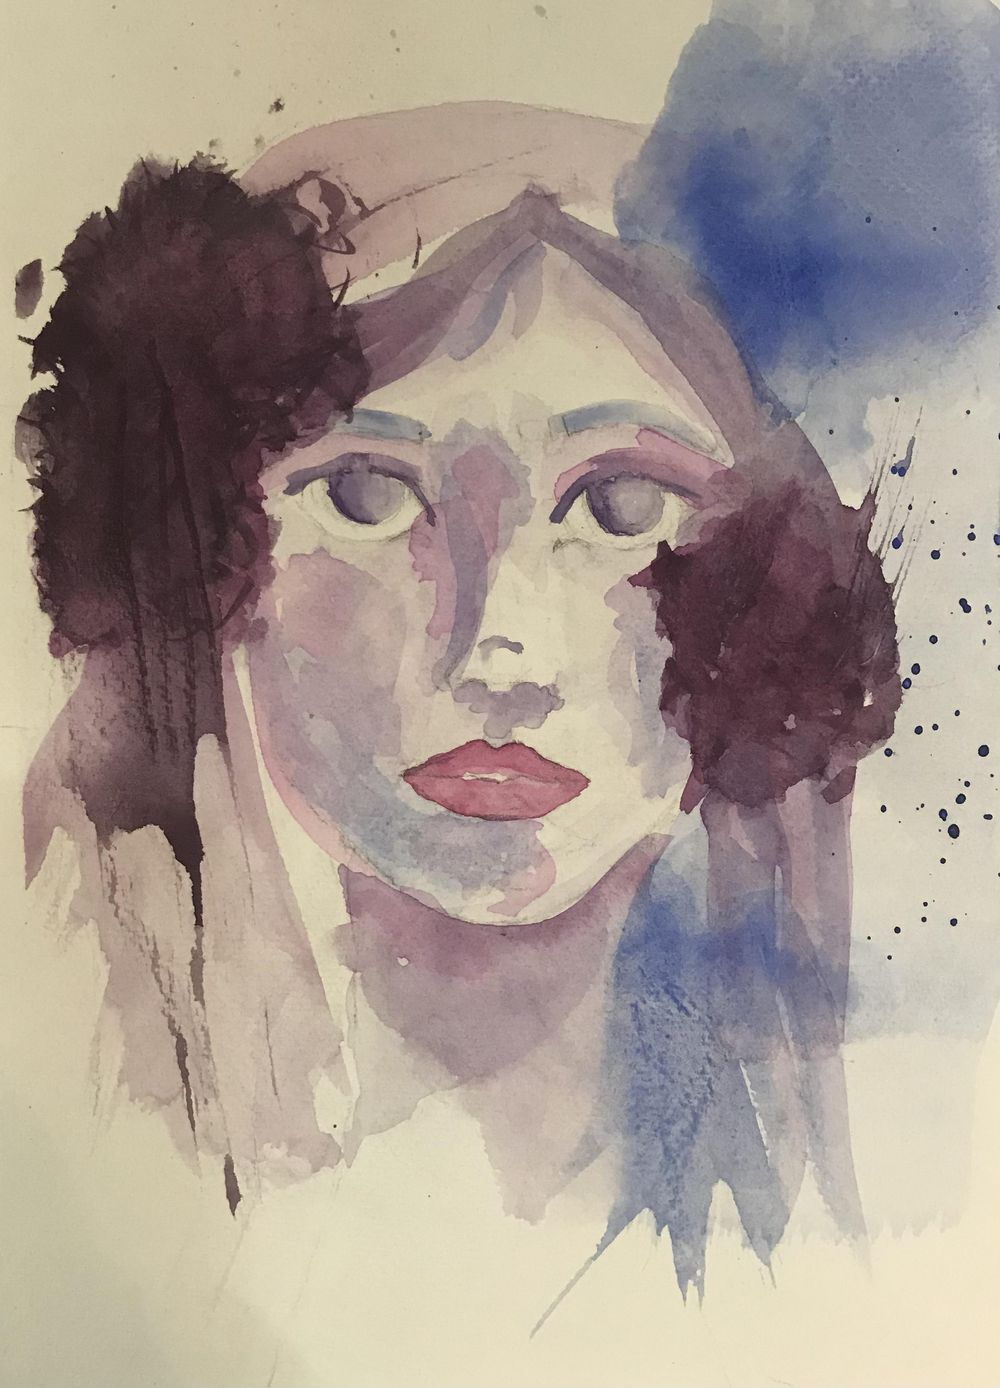 Una linda chica - image 1 - student project